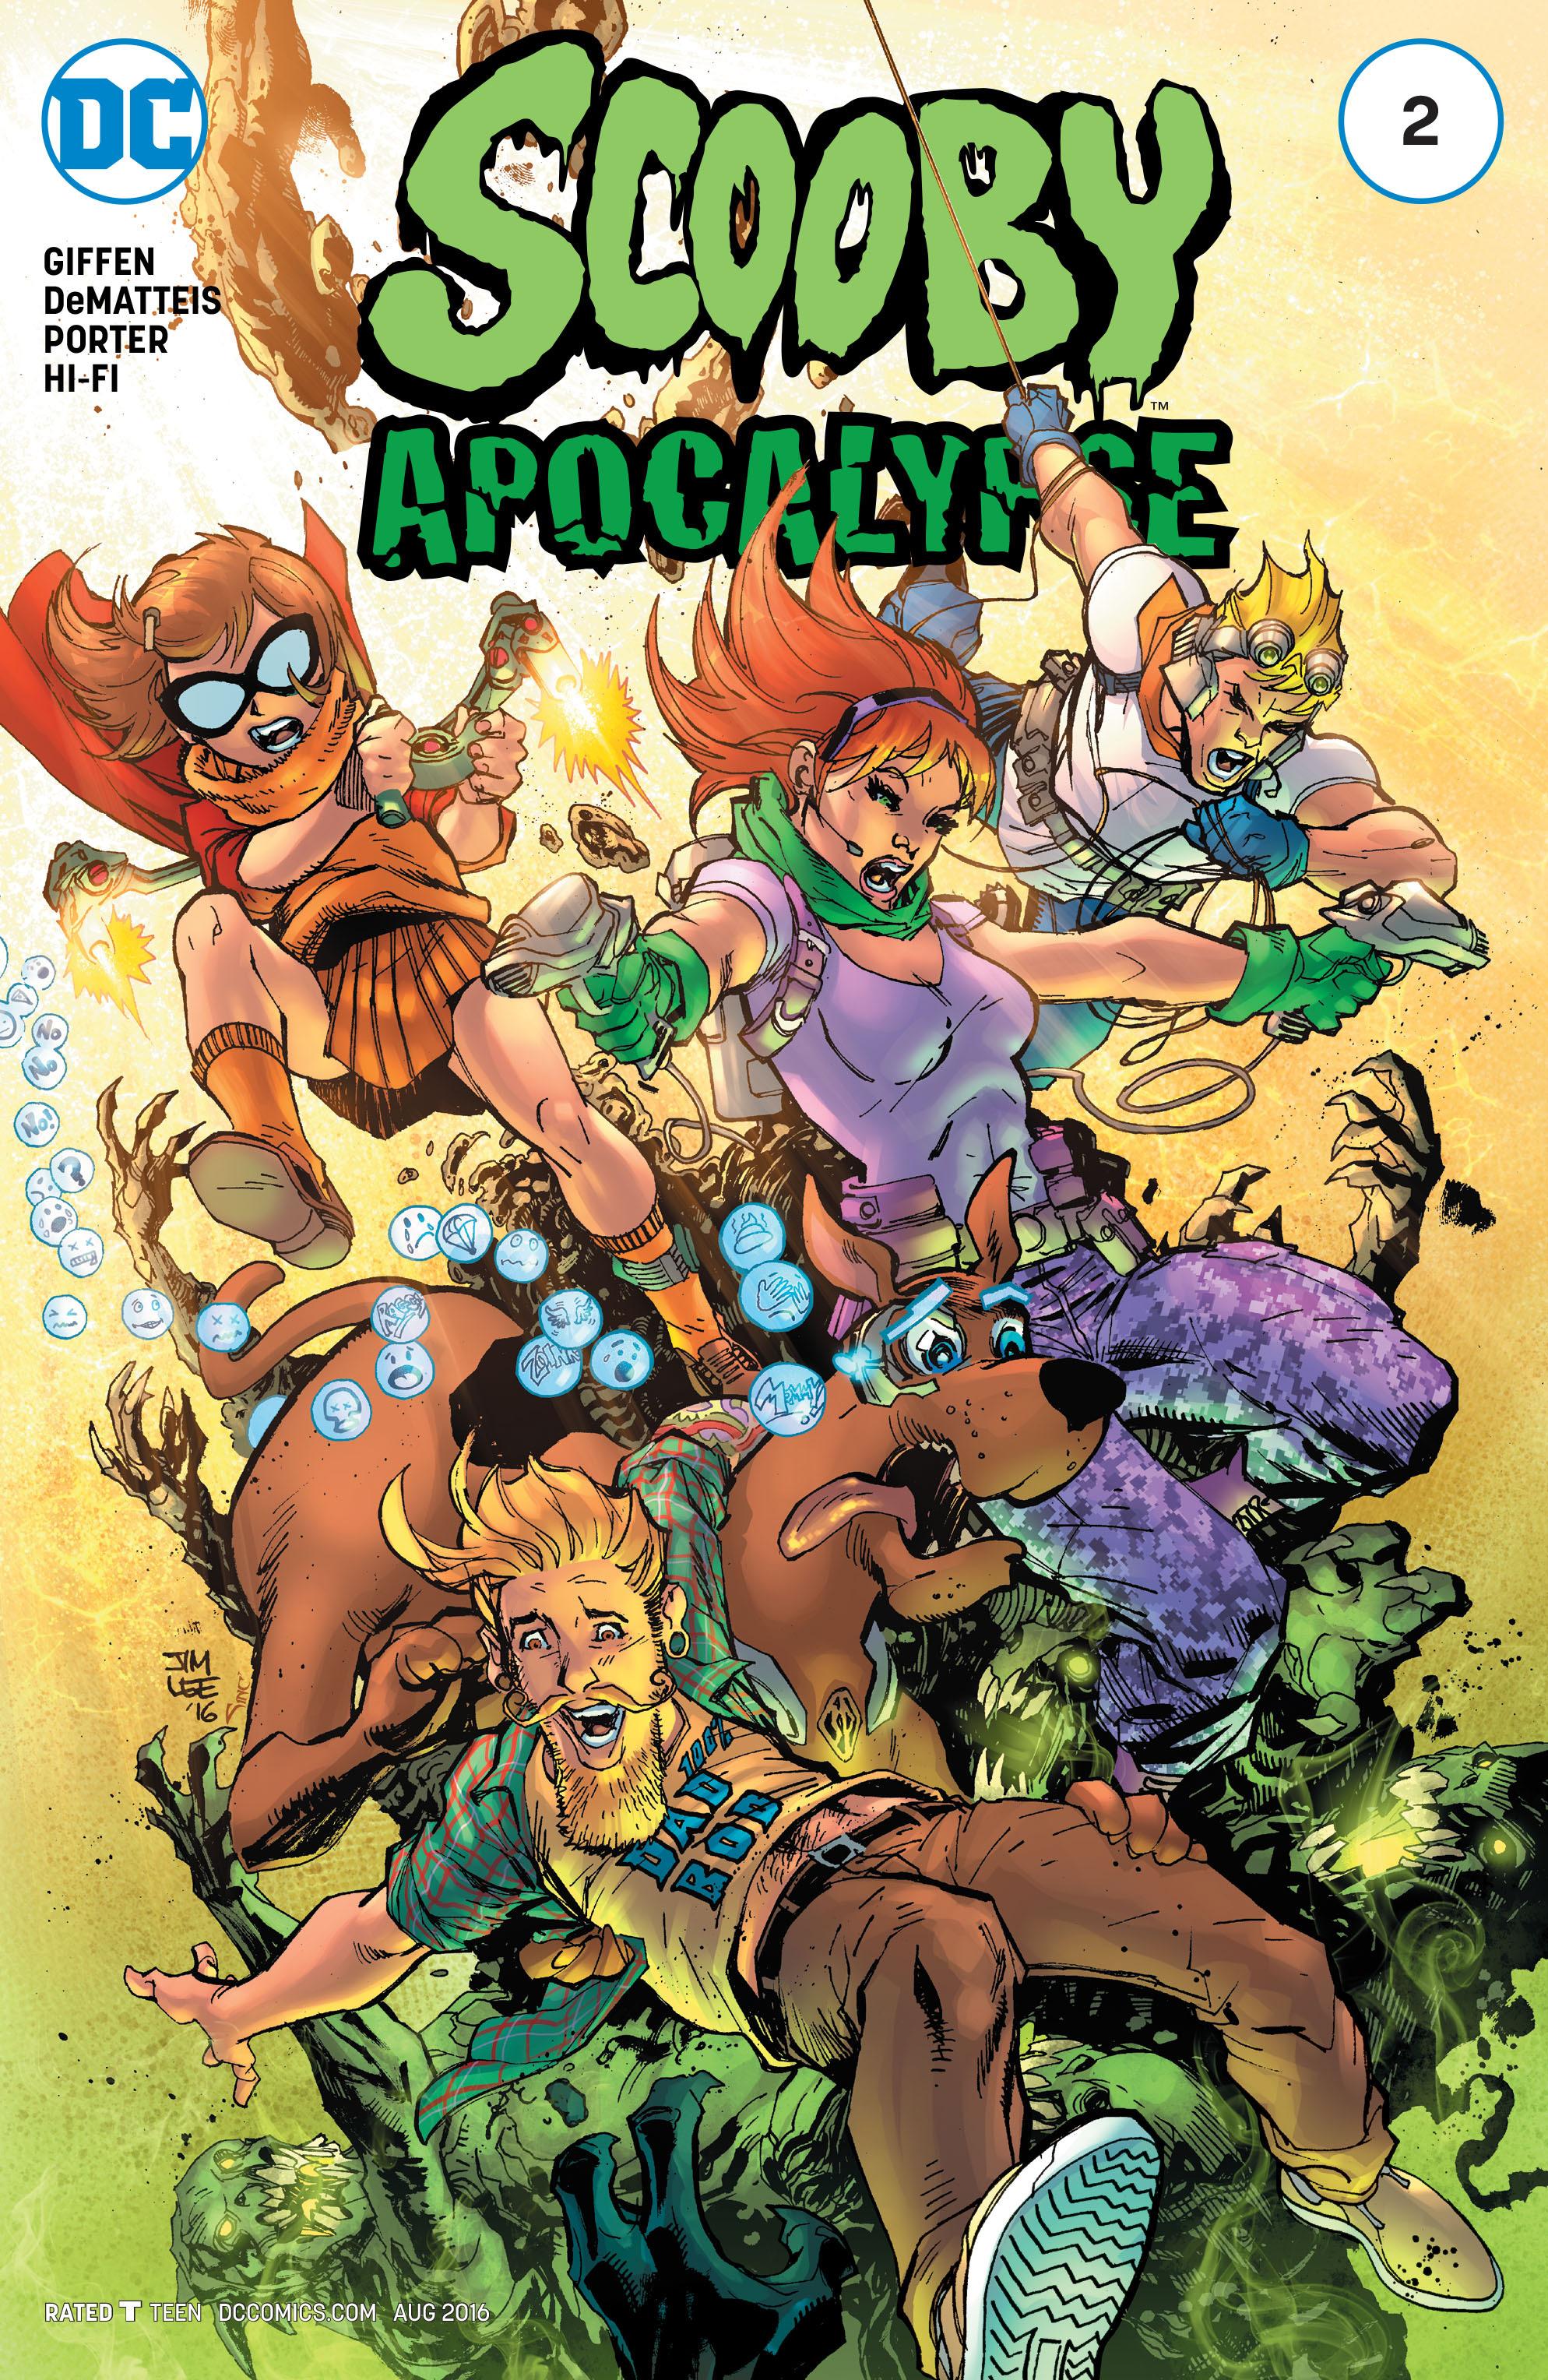 Read online Scooby Apocalypse comic -  Issue #2 - 1